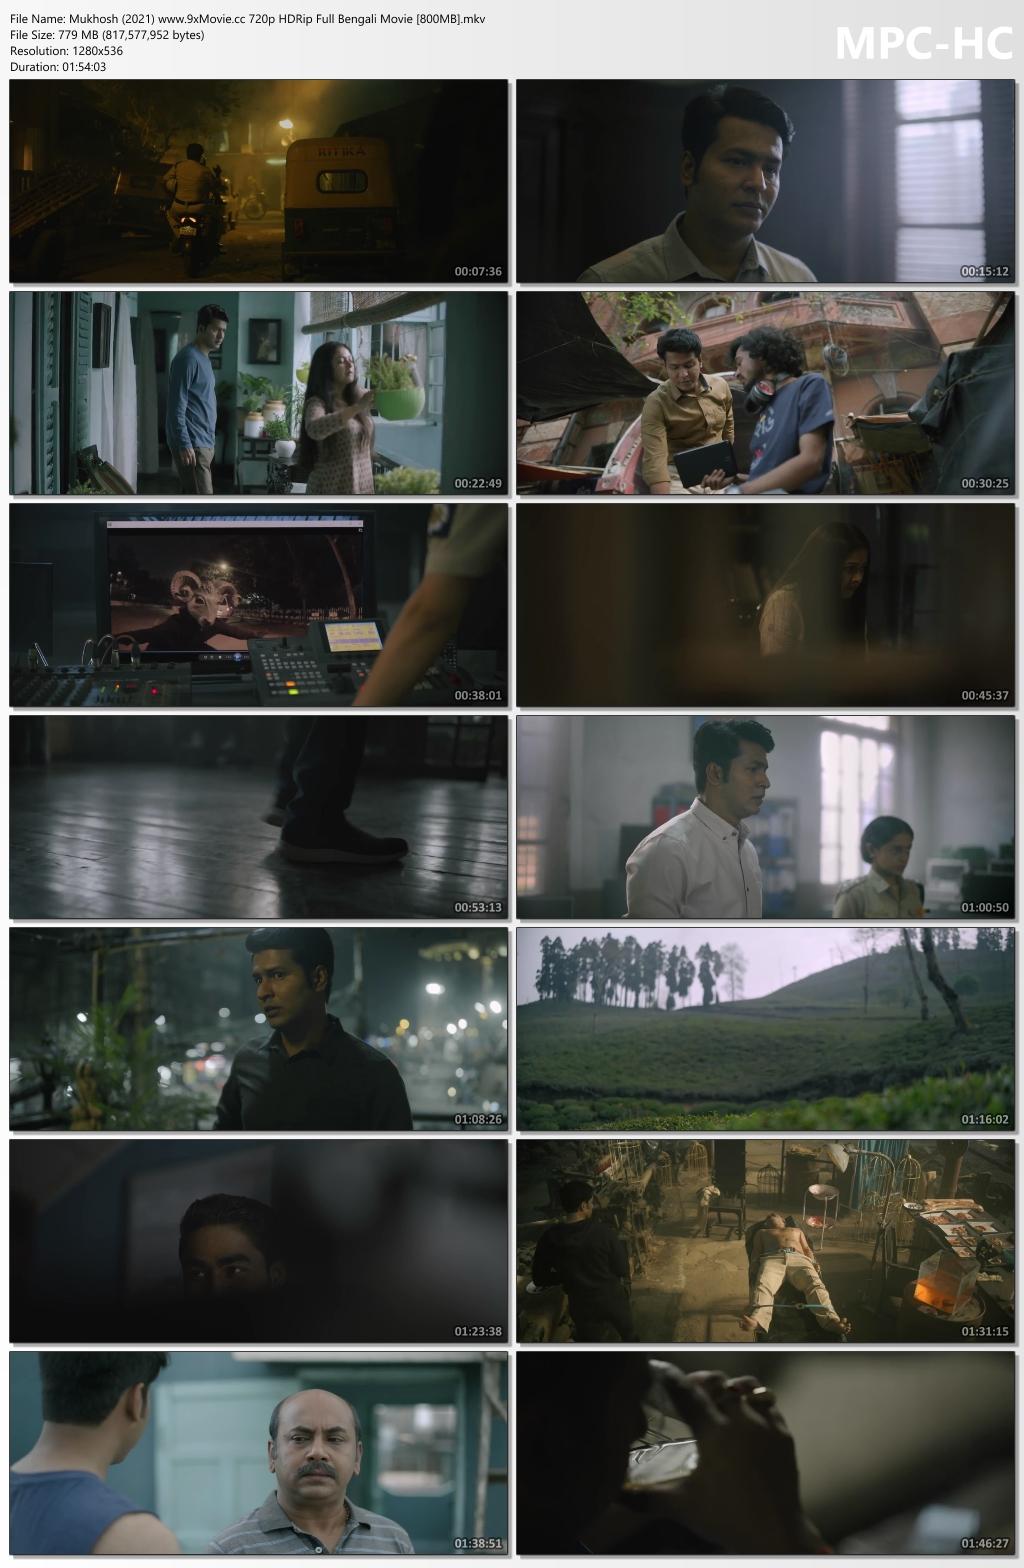 Mukhosh-2021-www-9x-Movie-cc-720p-HDRip-Full-Bengali-Movie-800-MB-mkv